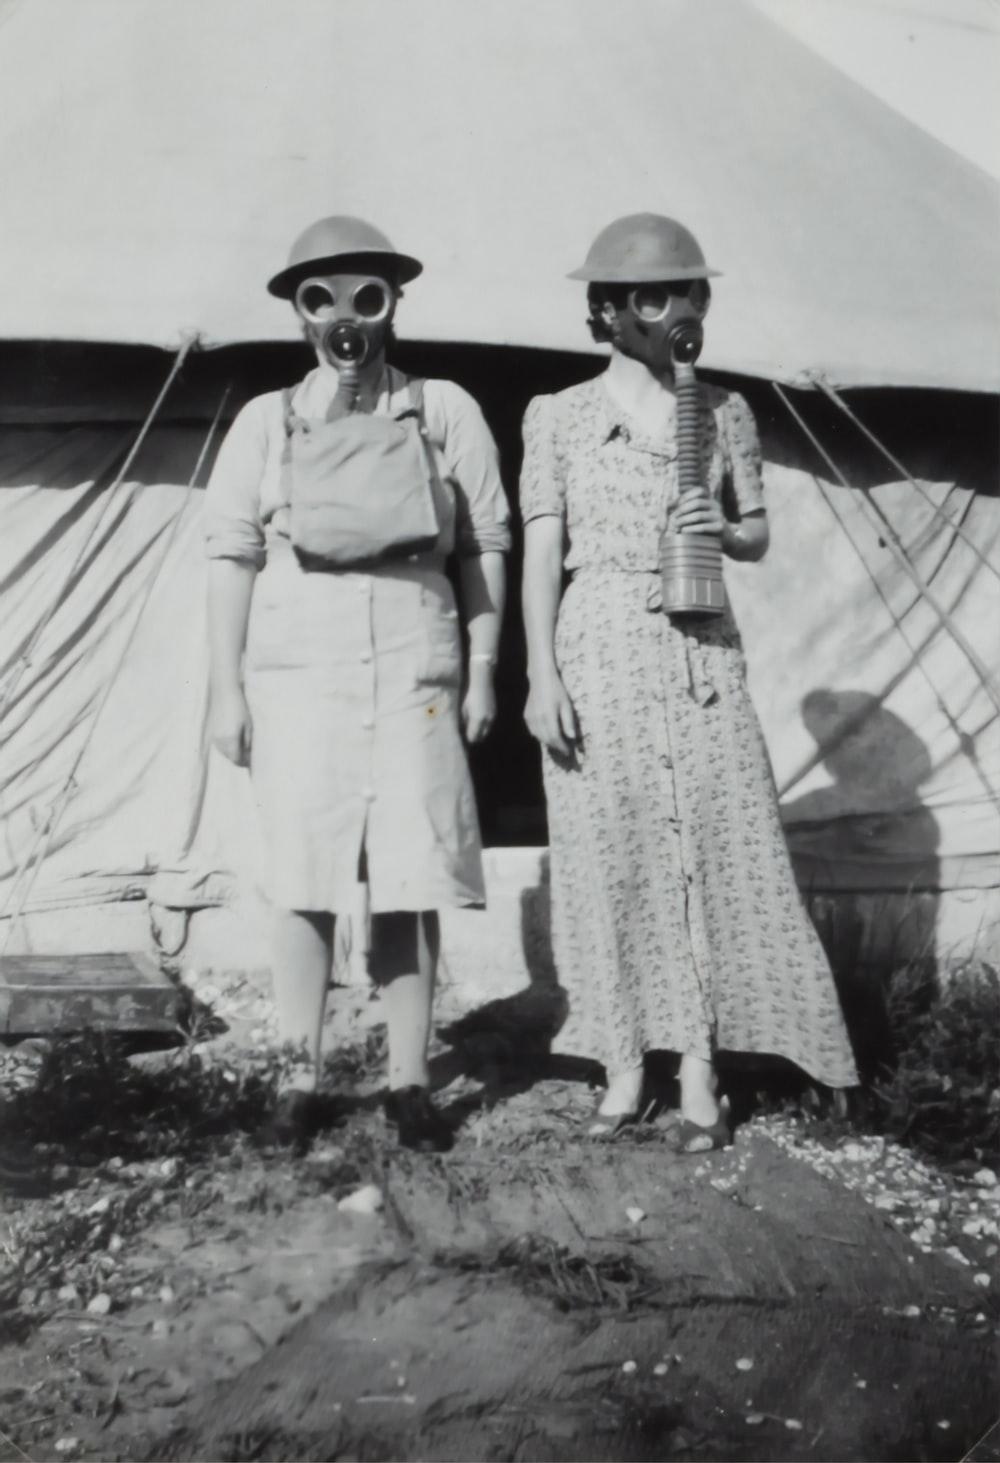 two women wearing gas mask standing beside tent